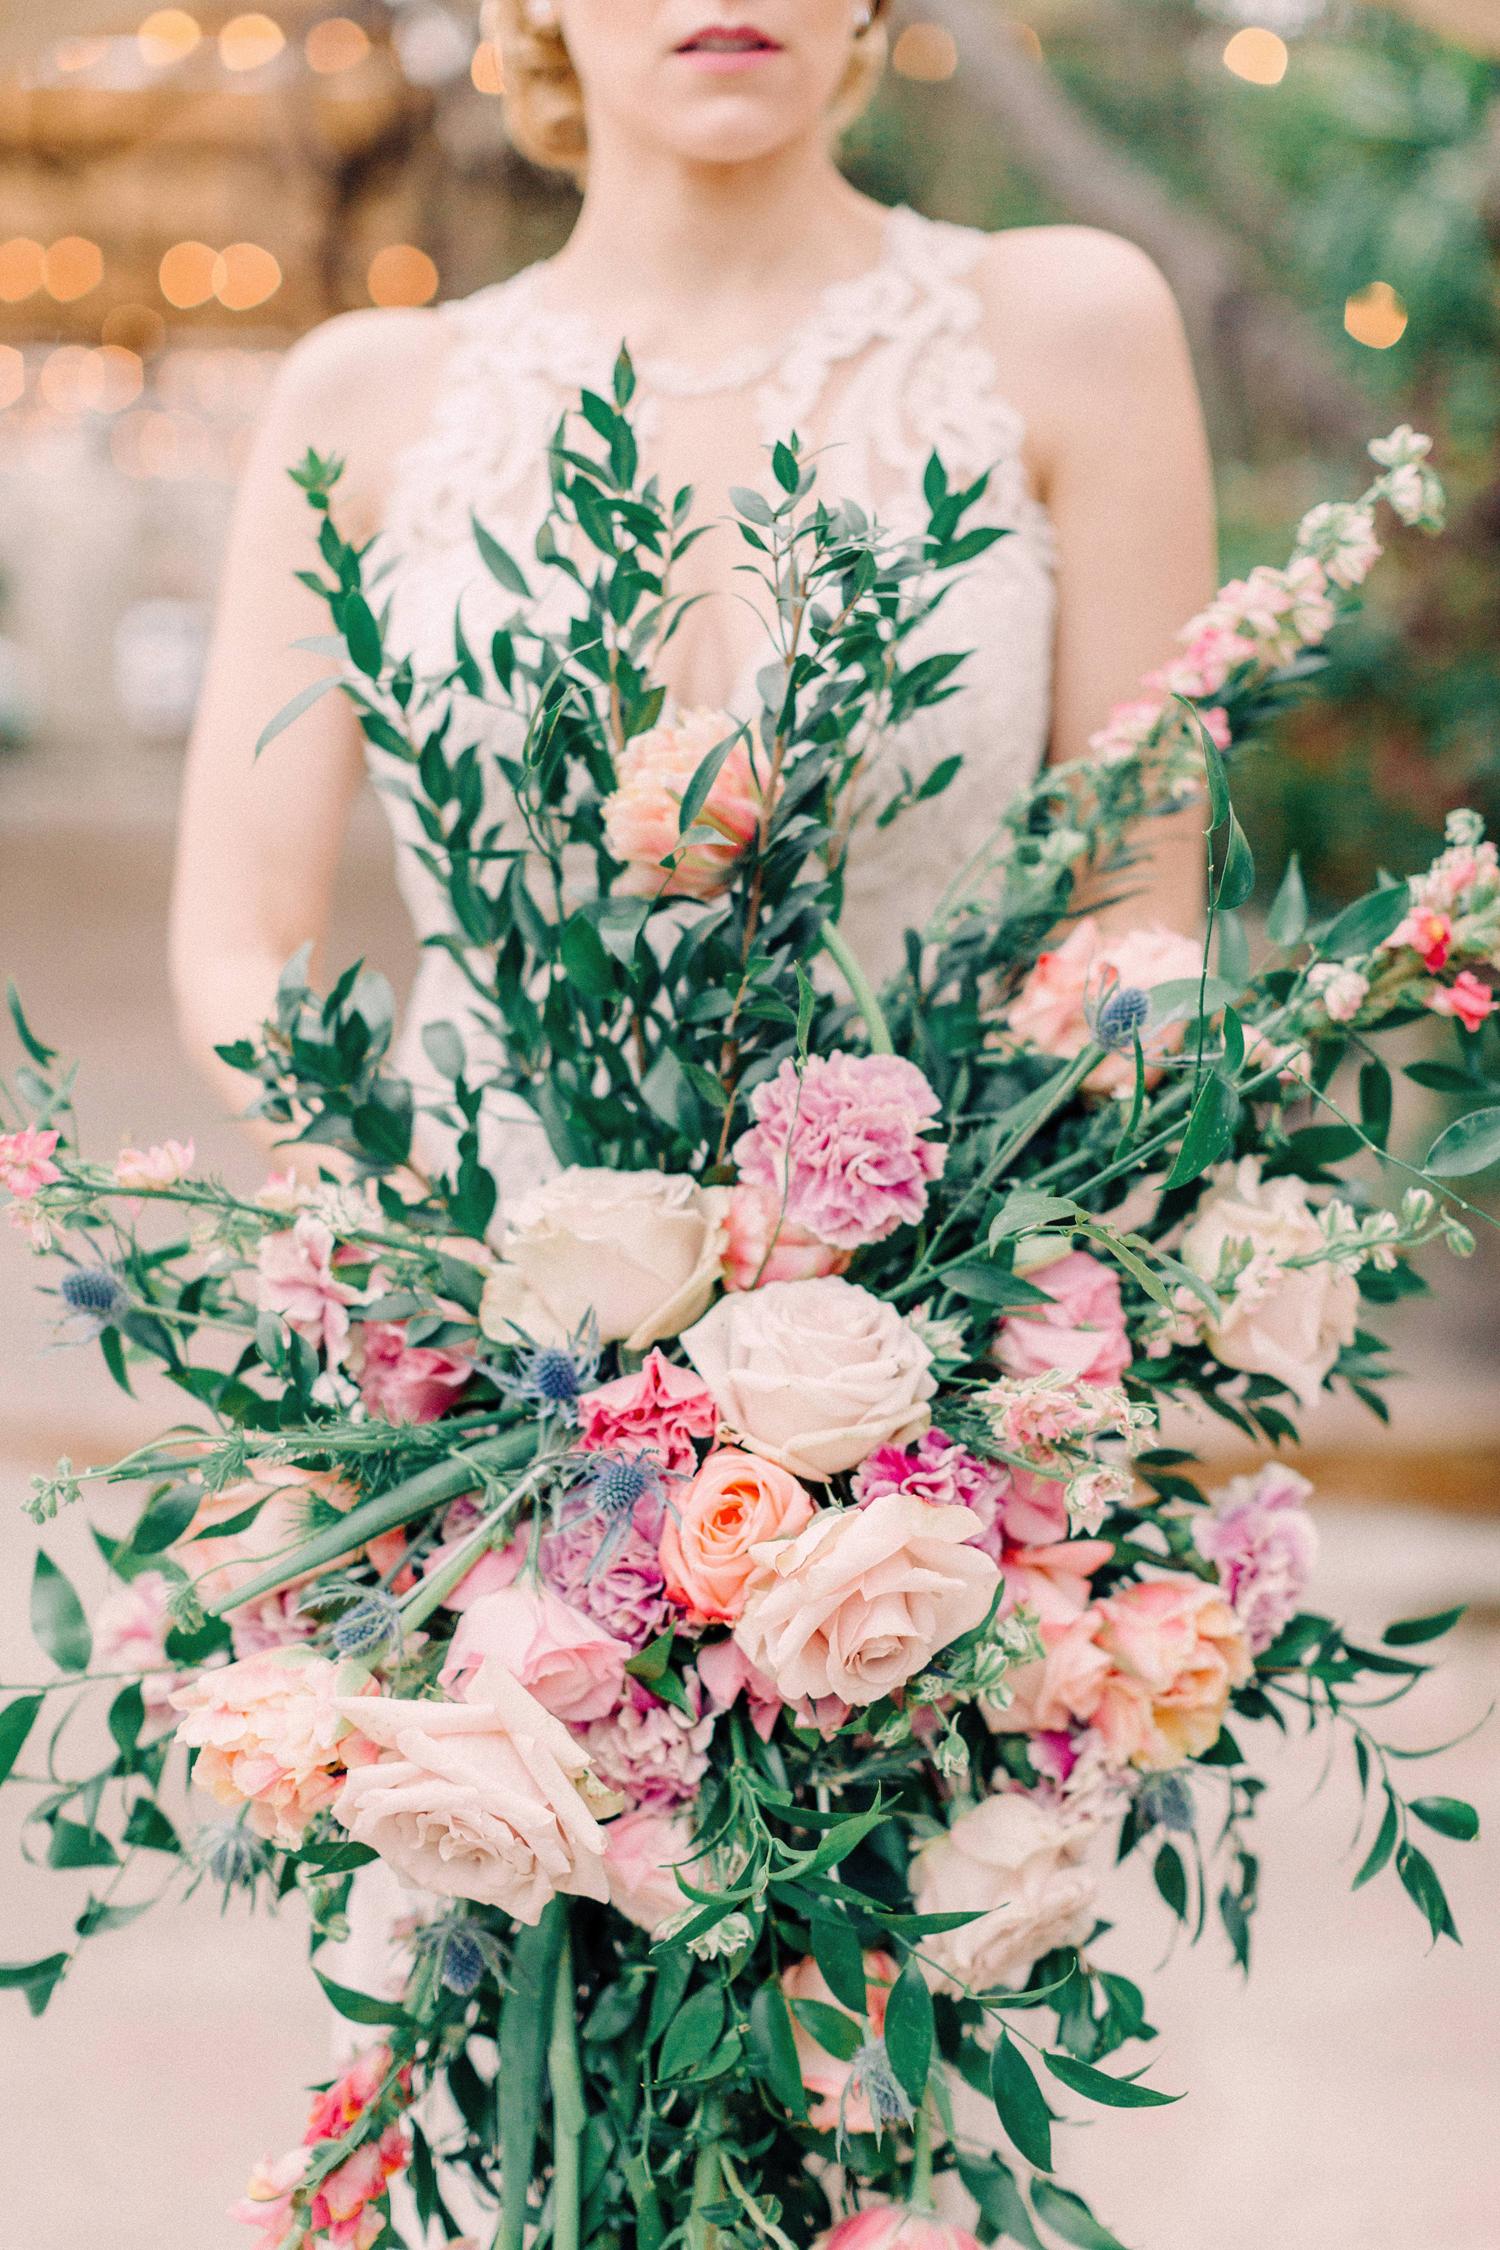 049-alaamarzouk-alaamarzoukphotography-mcallenweddingphotographer-alaa-marzouk-mcallen-mission-wedding-texas-venue-photography-wedding-california-bride-bridal-engagement-austin-elopement.jpg